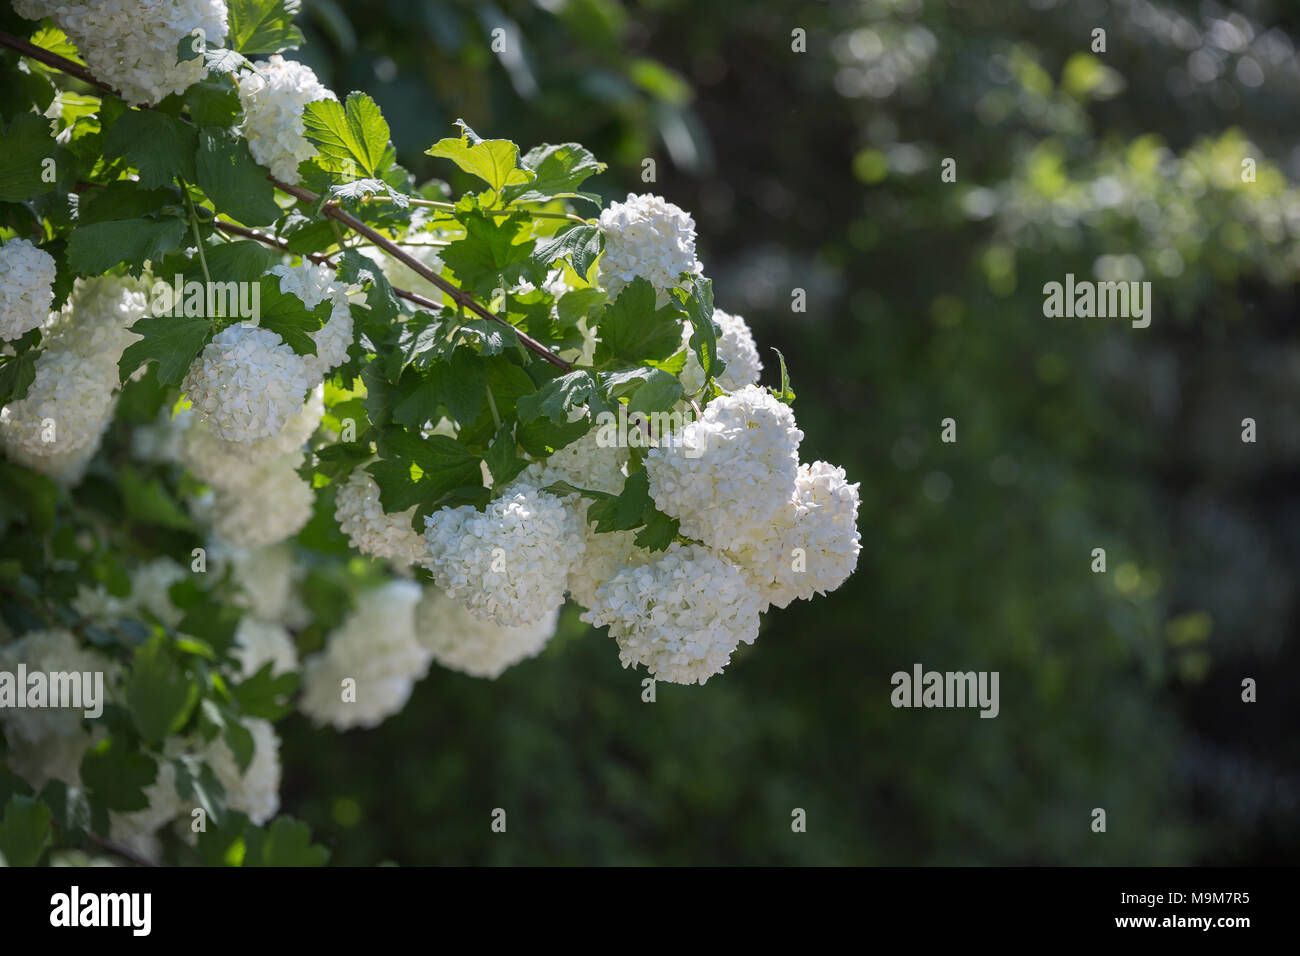 Ornamental Plant Snowball Viburnum White Flowers In A Garden Stock